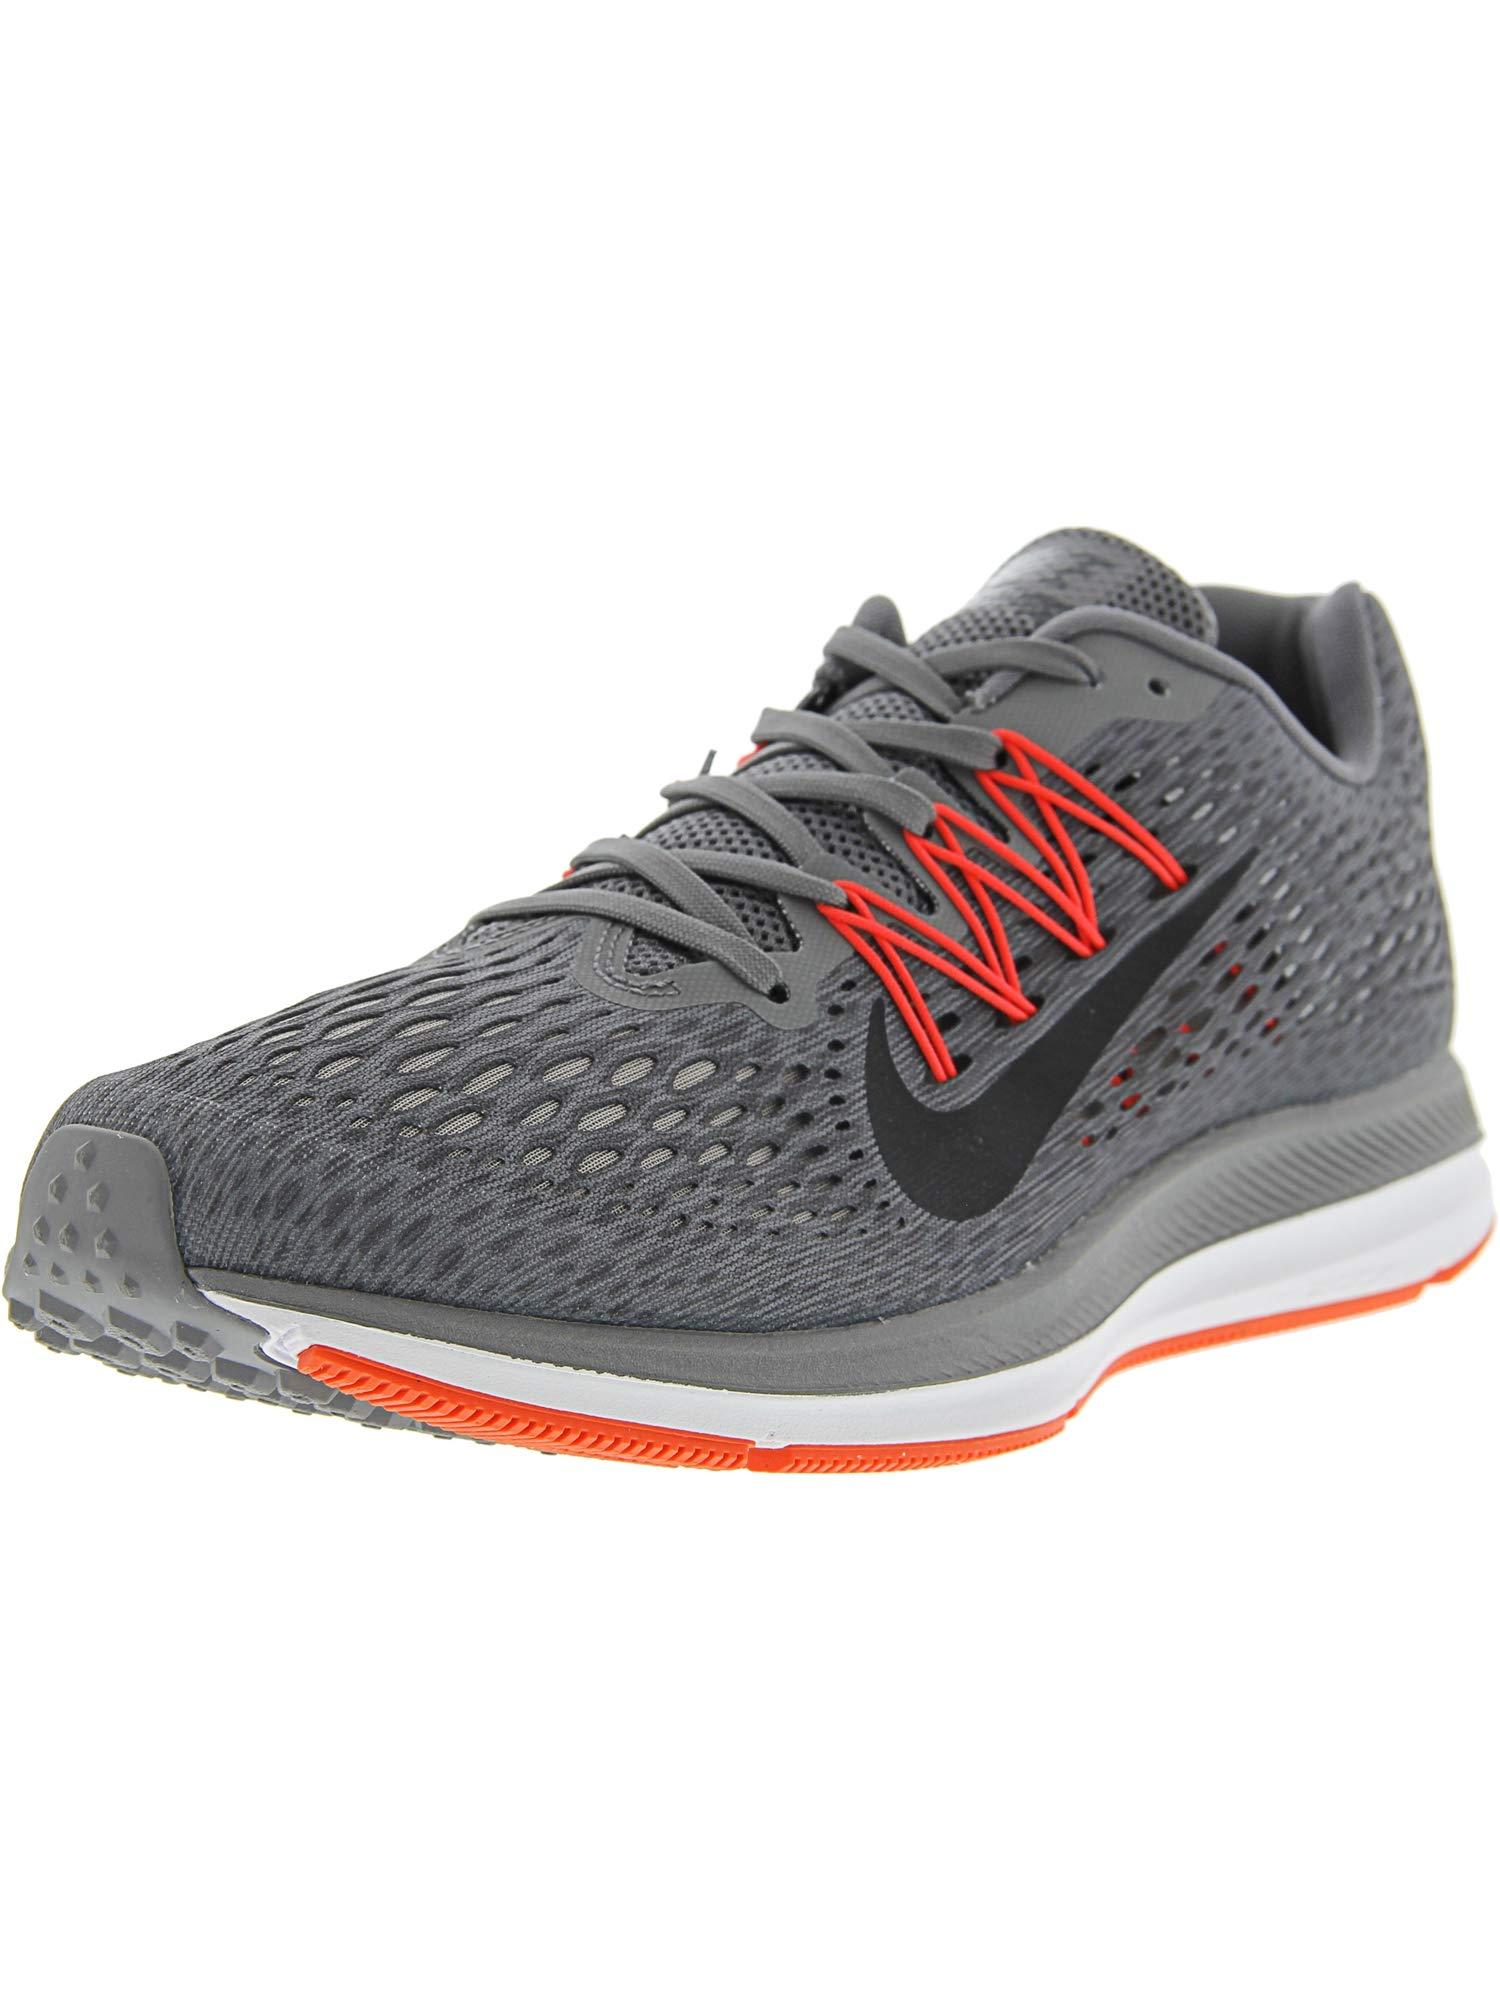 new style 8acfe 7f9d3 Nike Men's Air Zoom Winflo 5 Running Shoe (9.5 M US, Gunsmoke Grey Thunder  Grey)